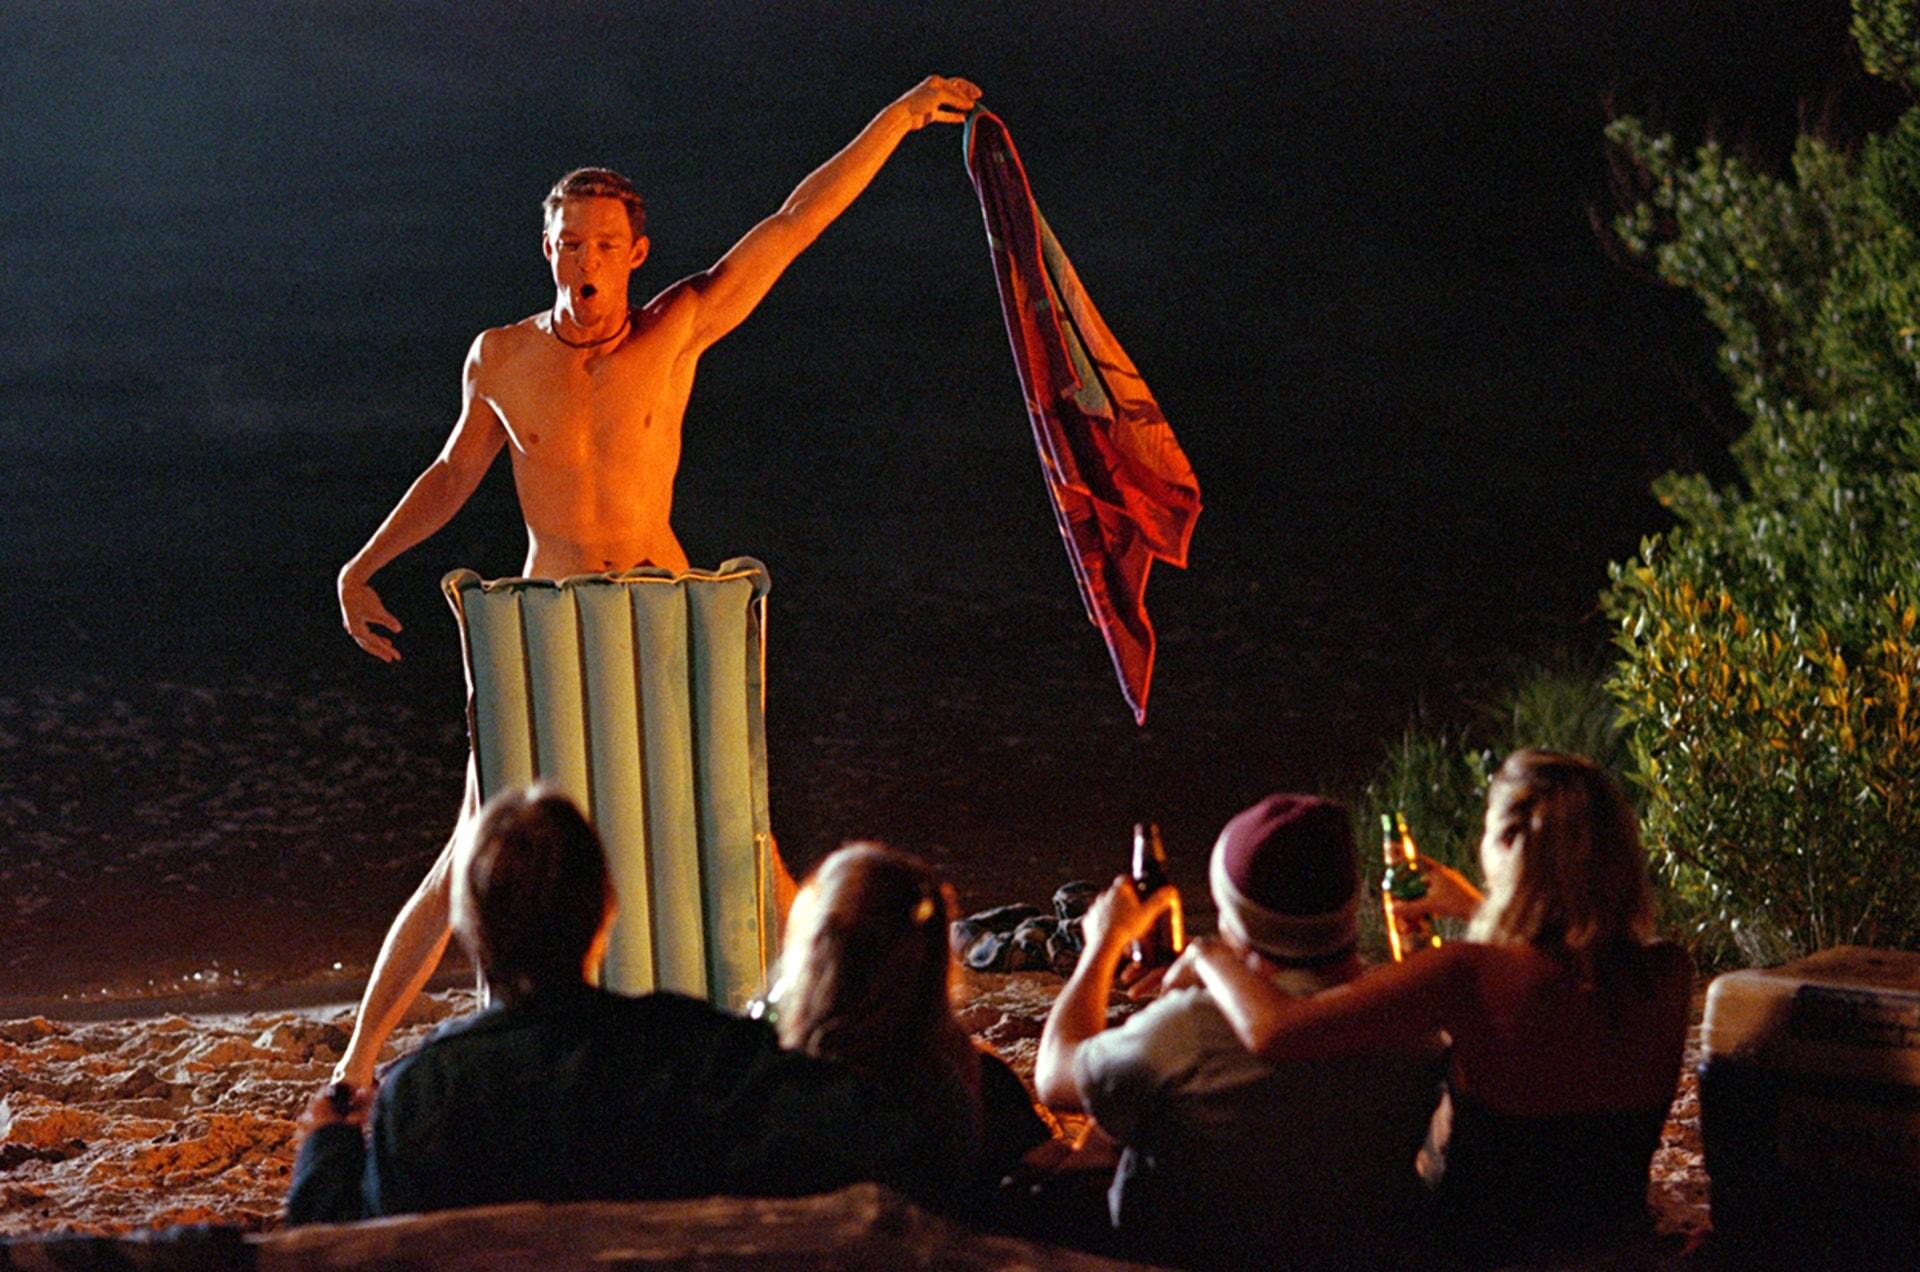 Matthew Lillard puts on a strip show on the beach in summer catch